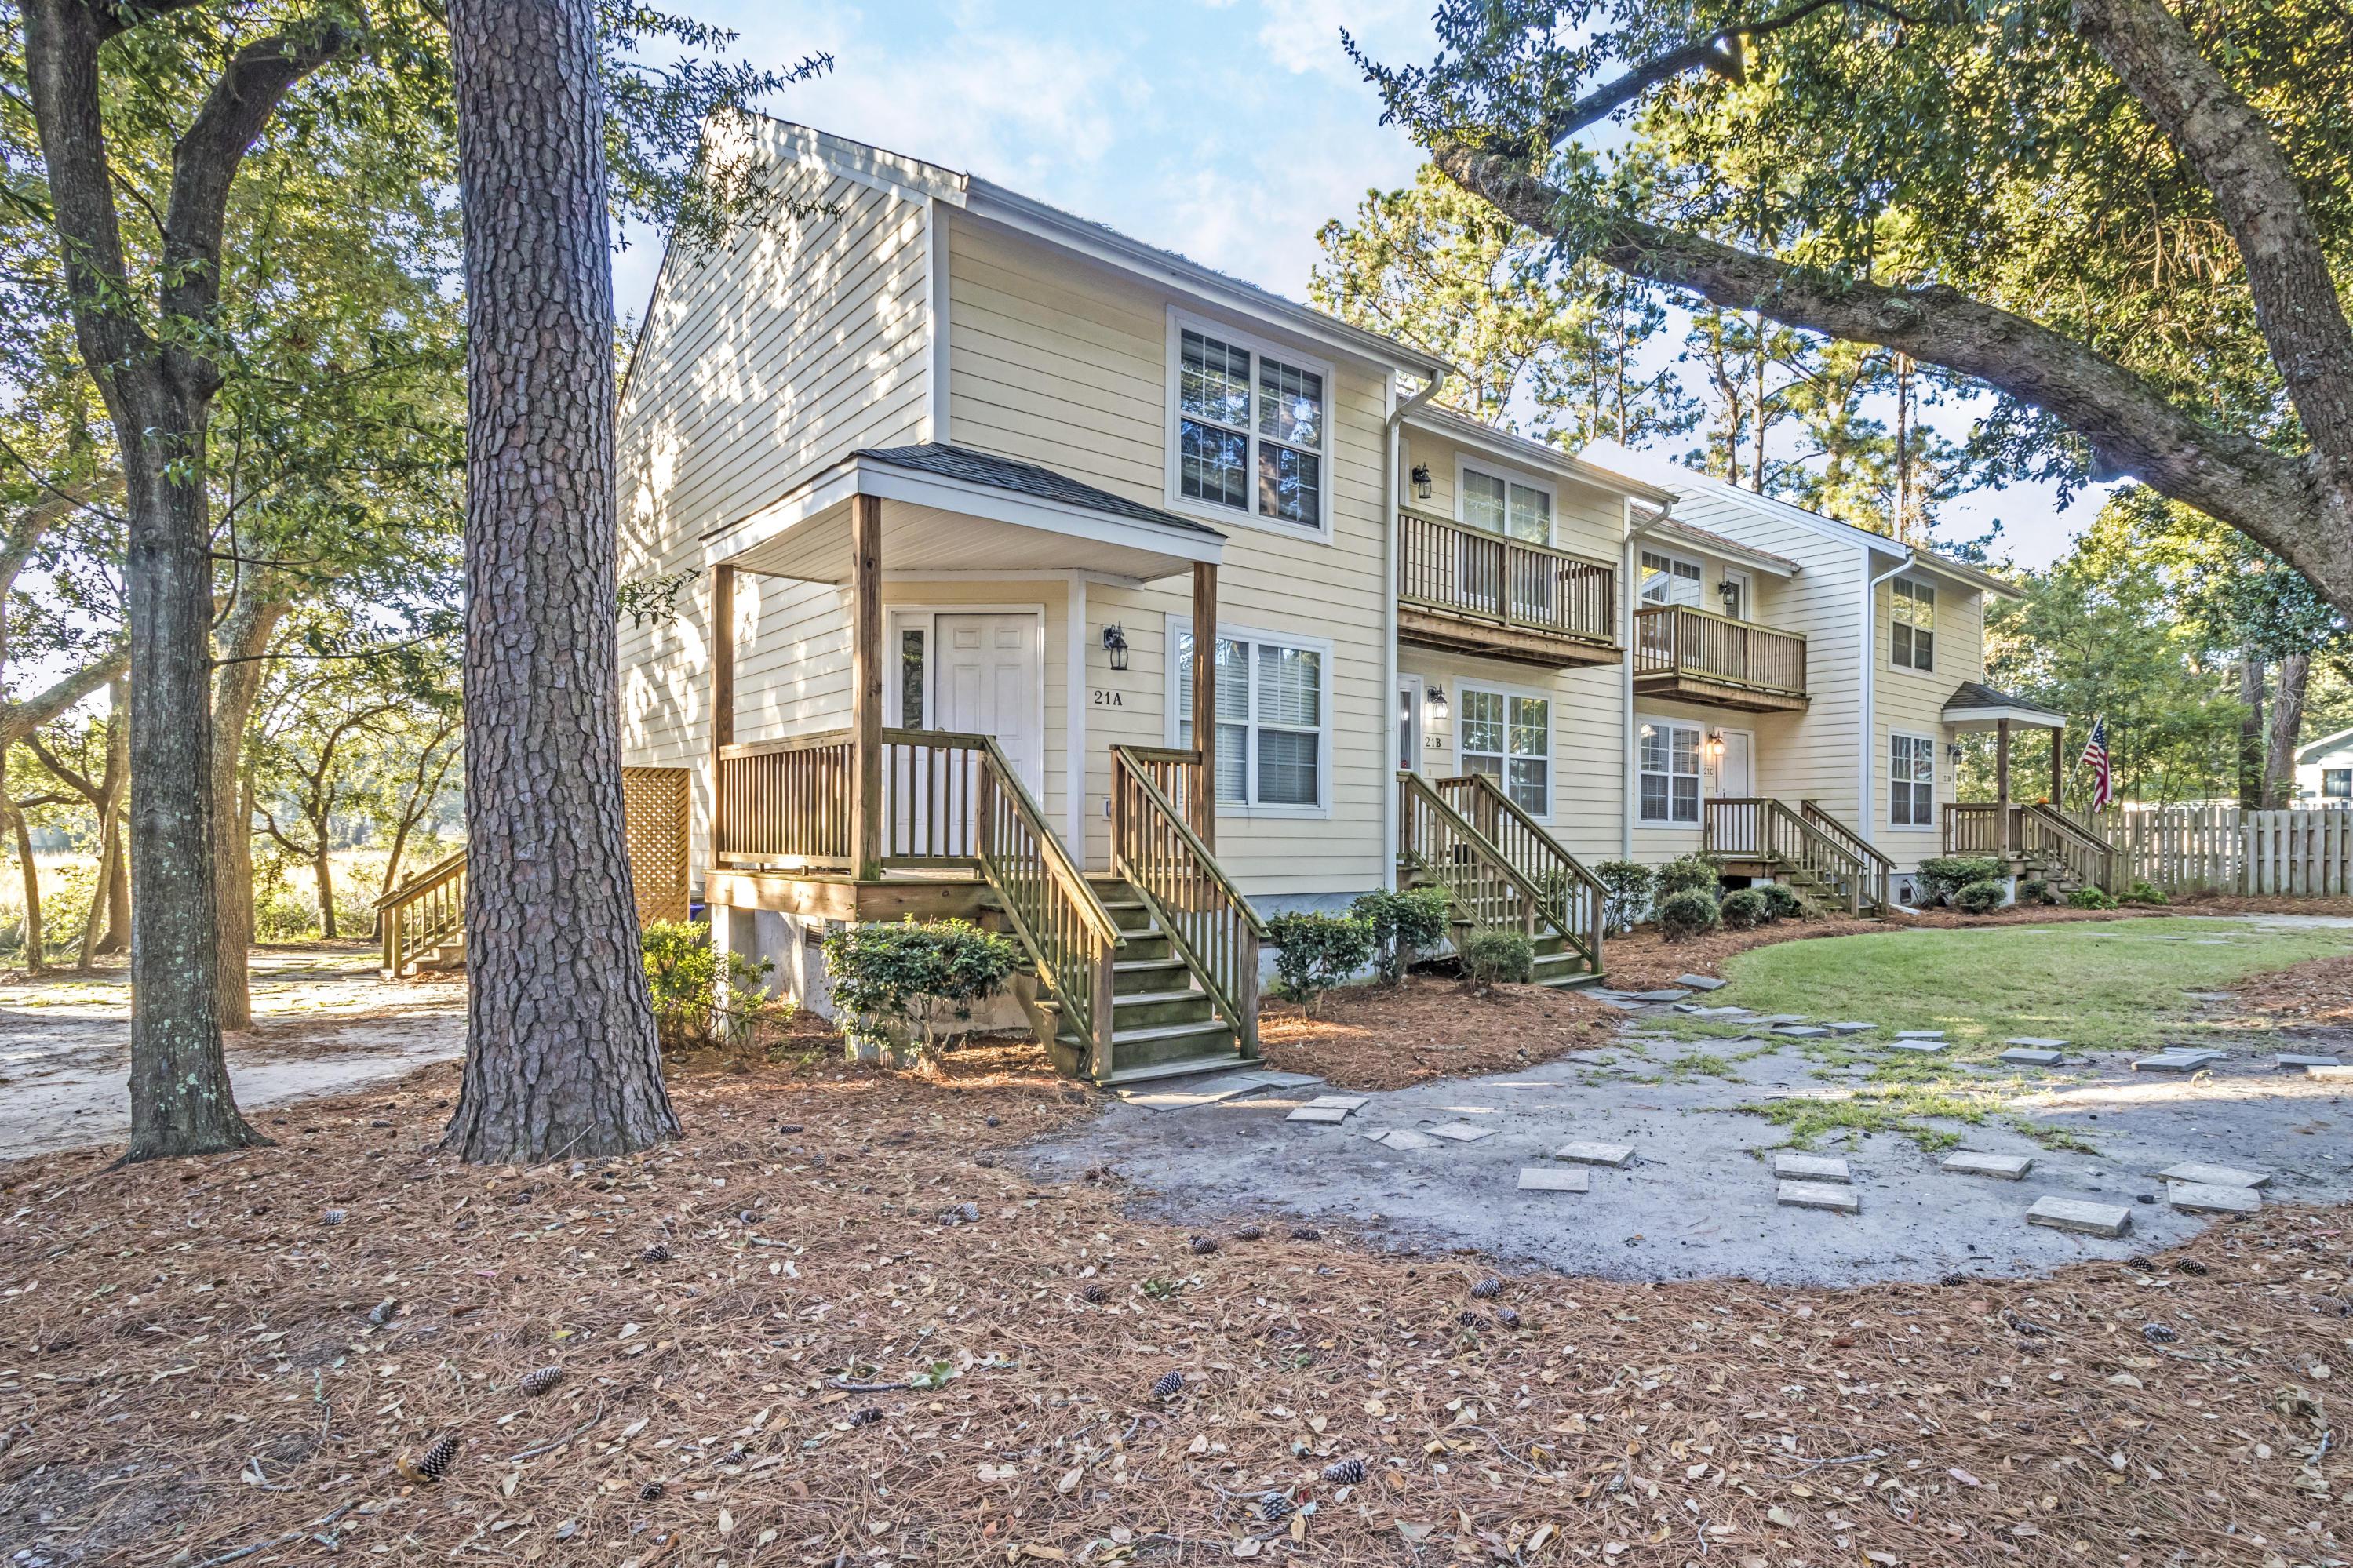 Pelican Cove Homes For Sale - 21 Brockman, Charleston, SC - 0